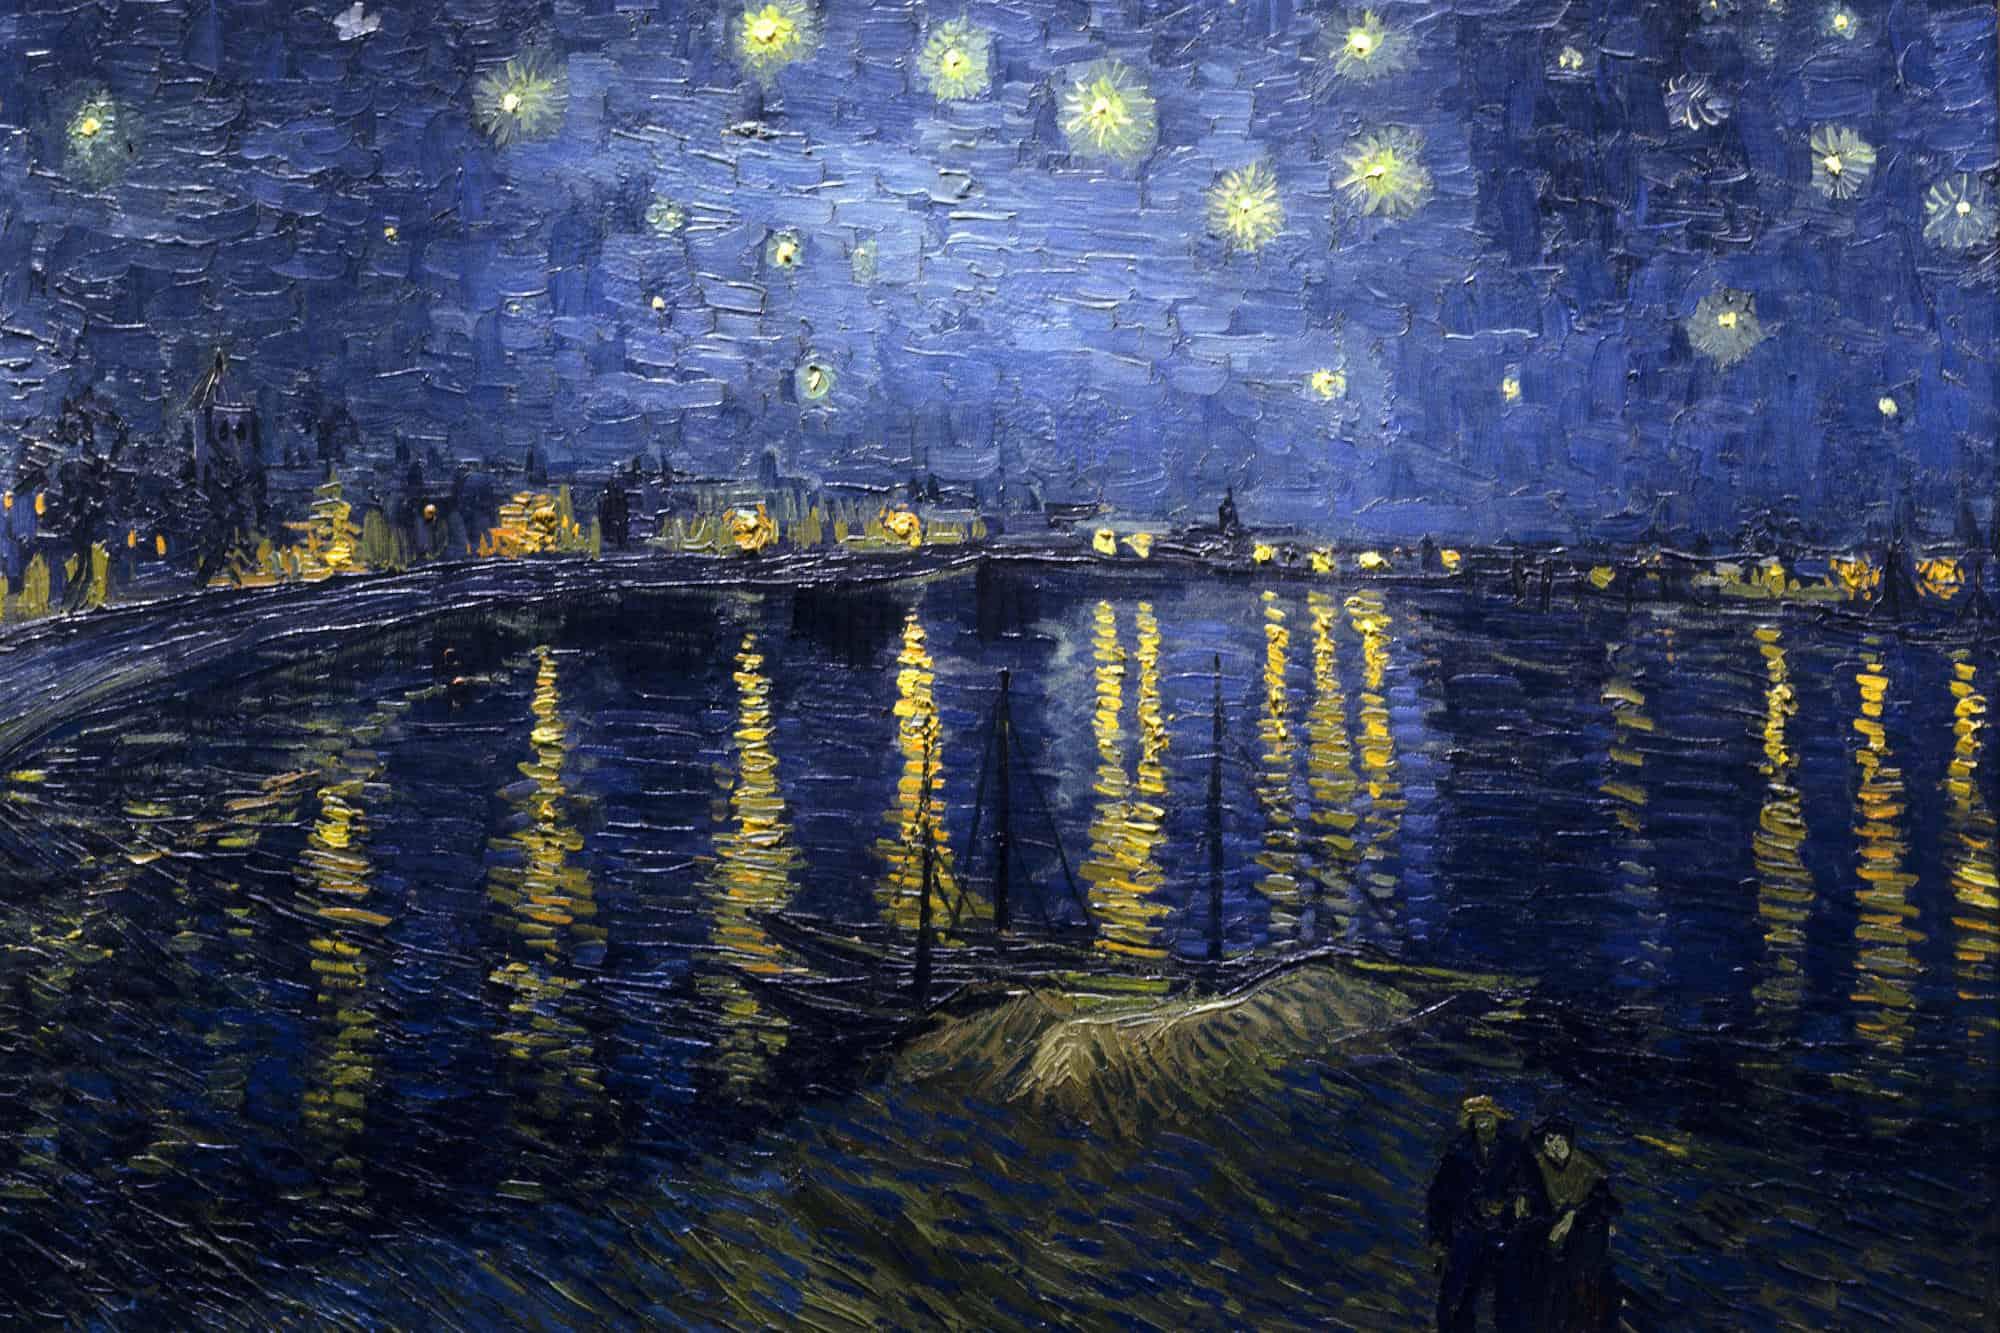 Photo of ليلة مرصعة بالنجوم على نهر الرون لـ فينسنت فان غوخ